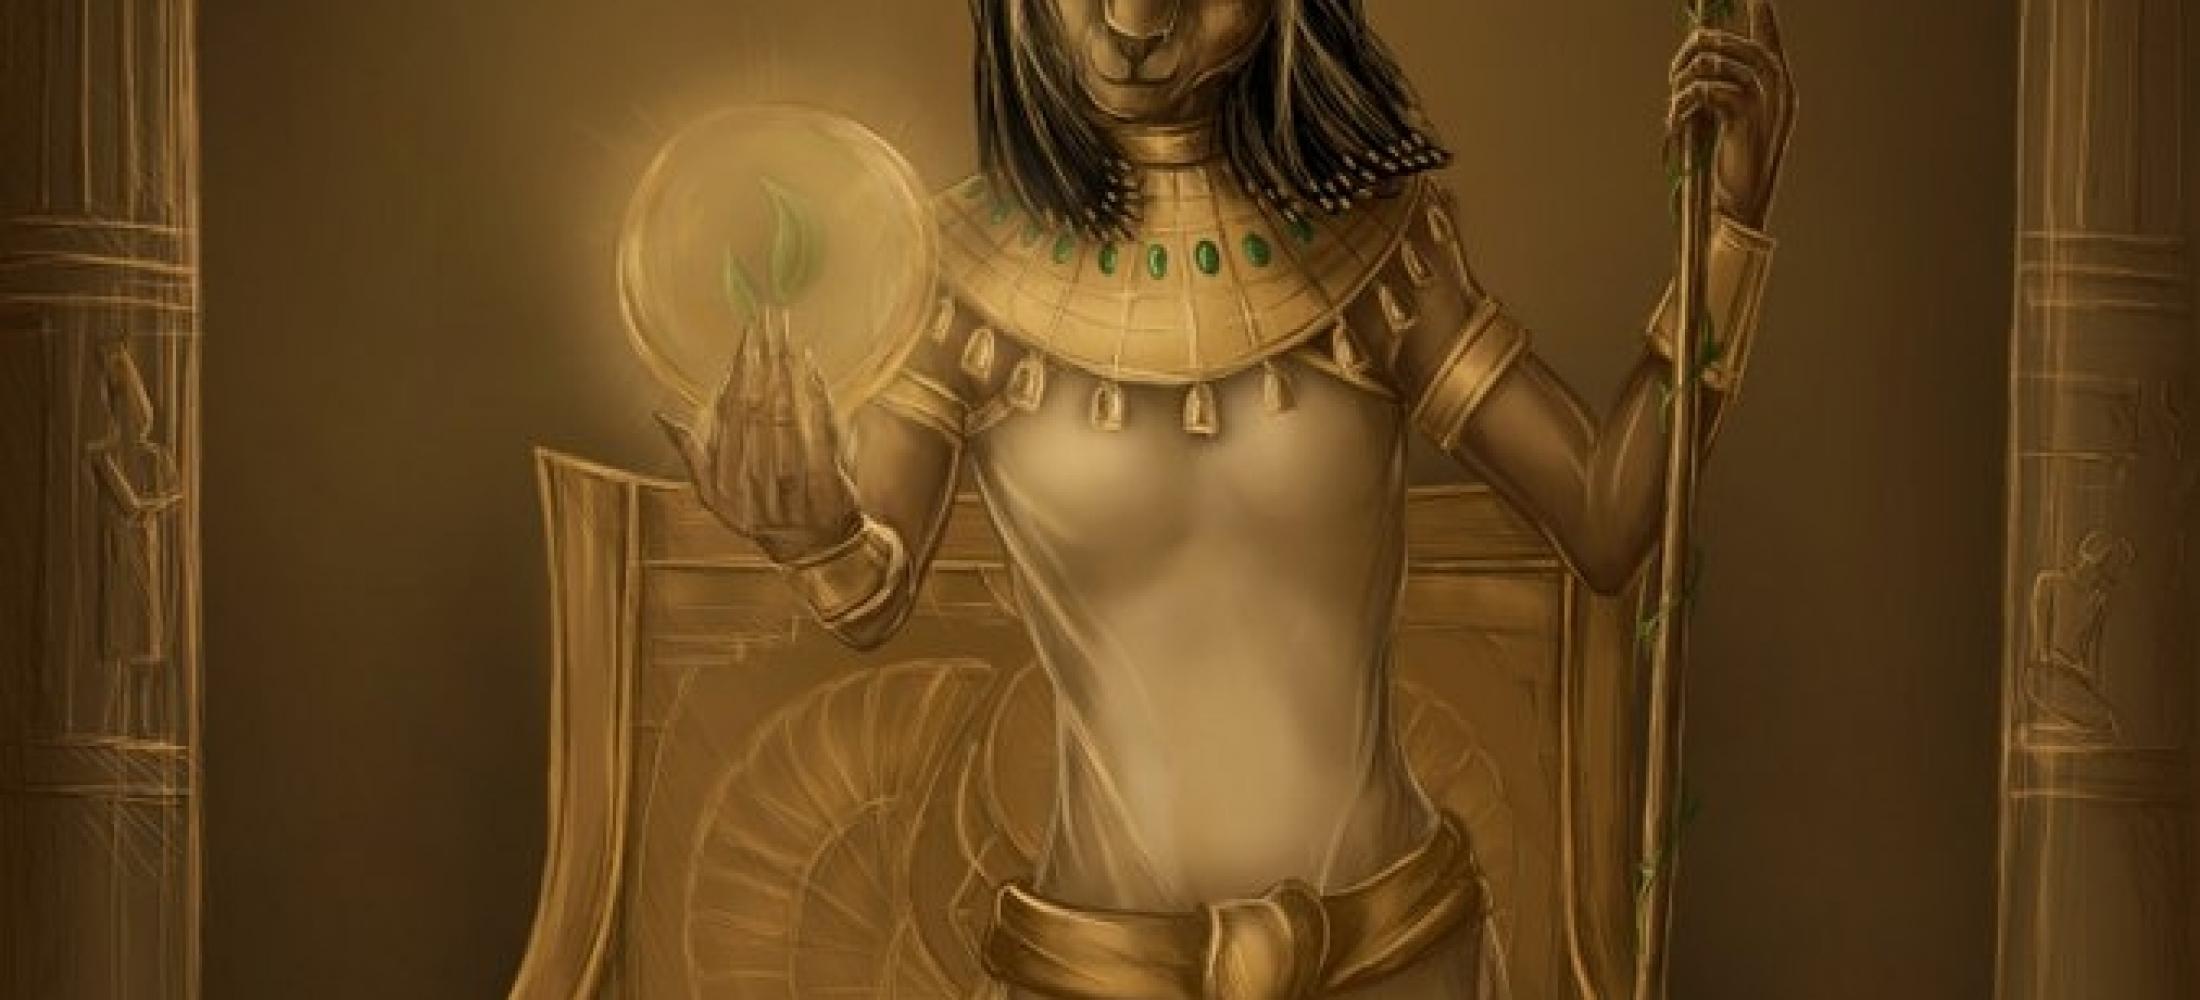 Баст, Богиня Баст, энергетический канал Баст (посвящение, инициация)